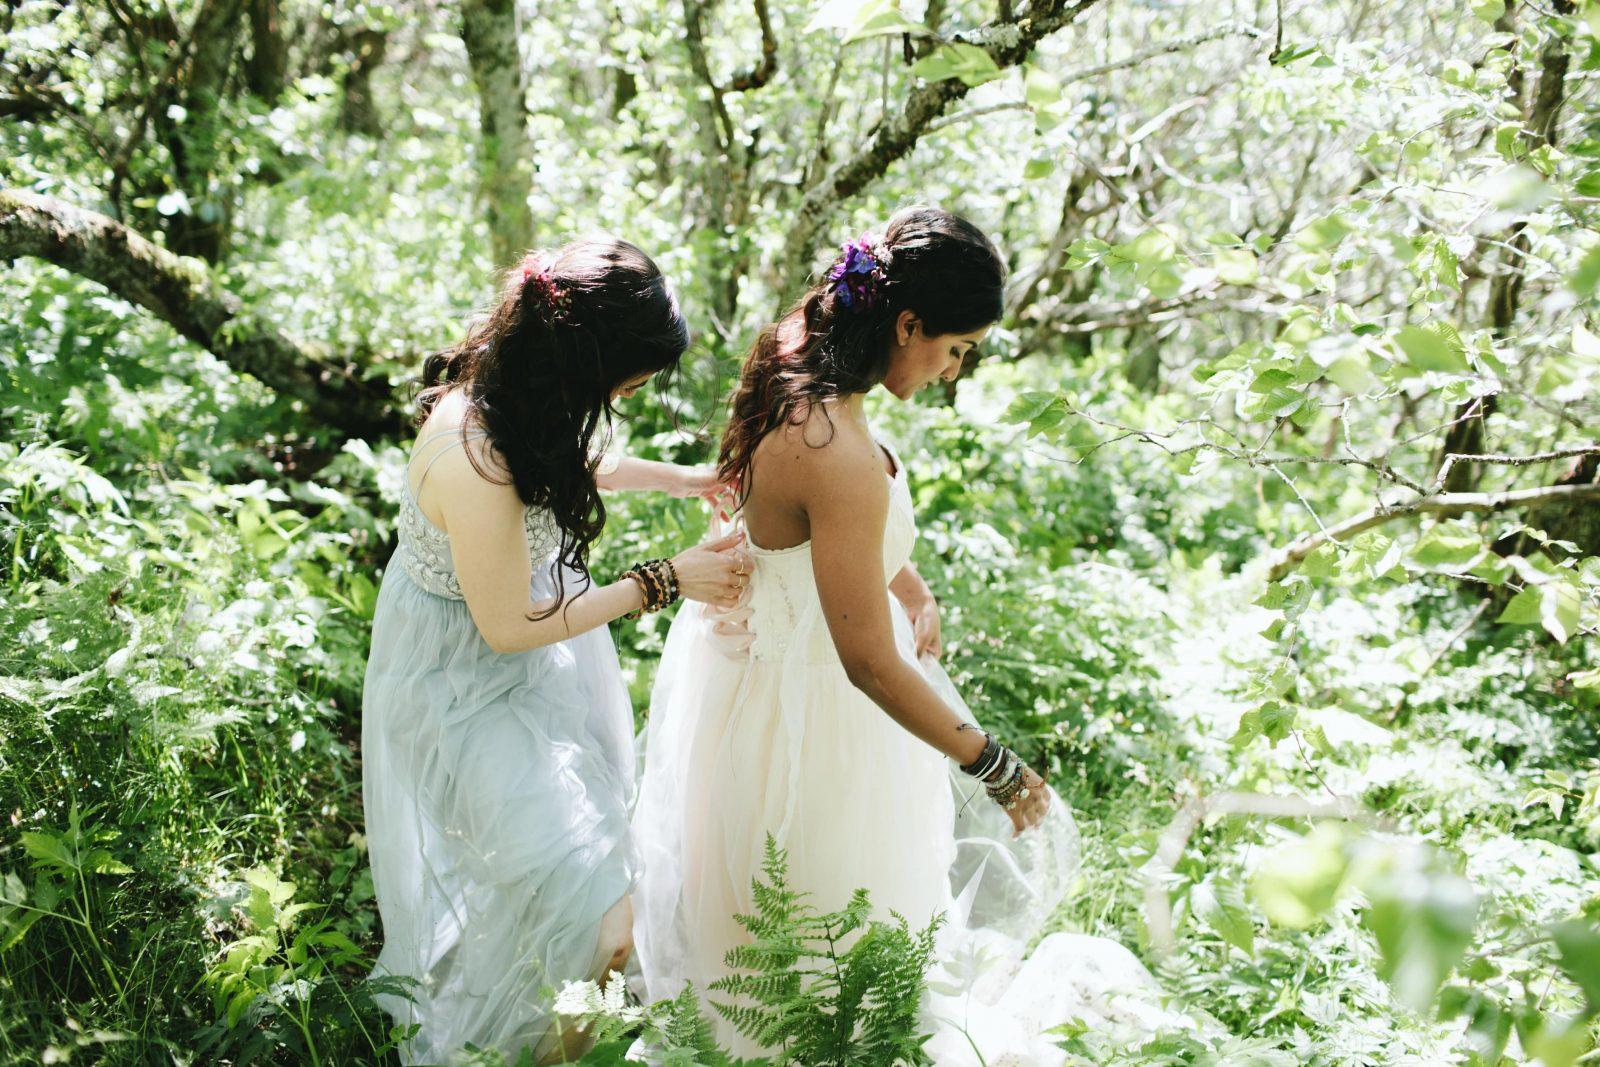 Custom Paeonia wedding dress by larimeloomCustom Paeonia wedding dress by larimeloom